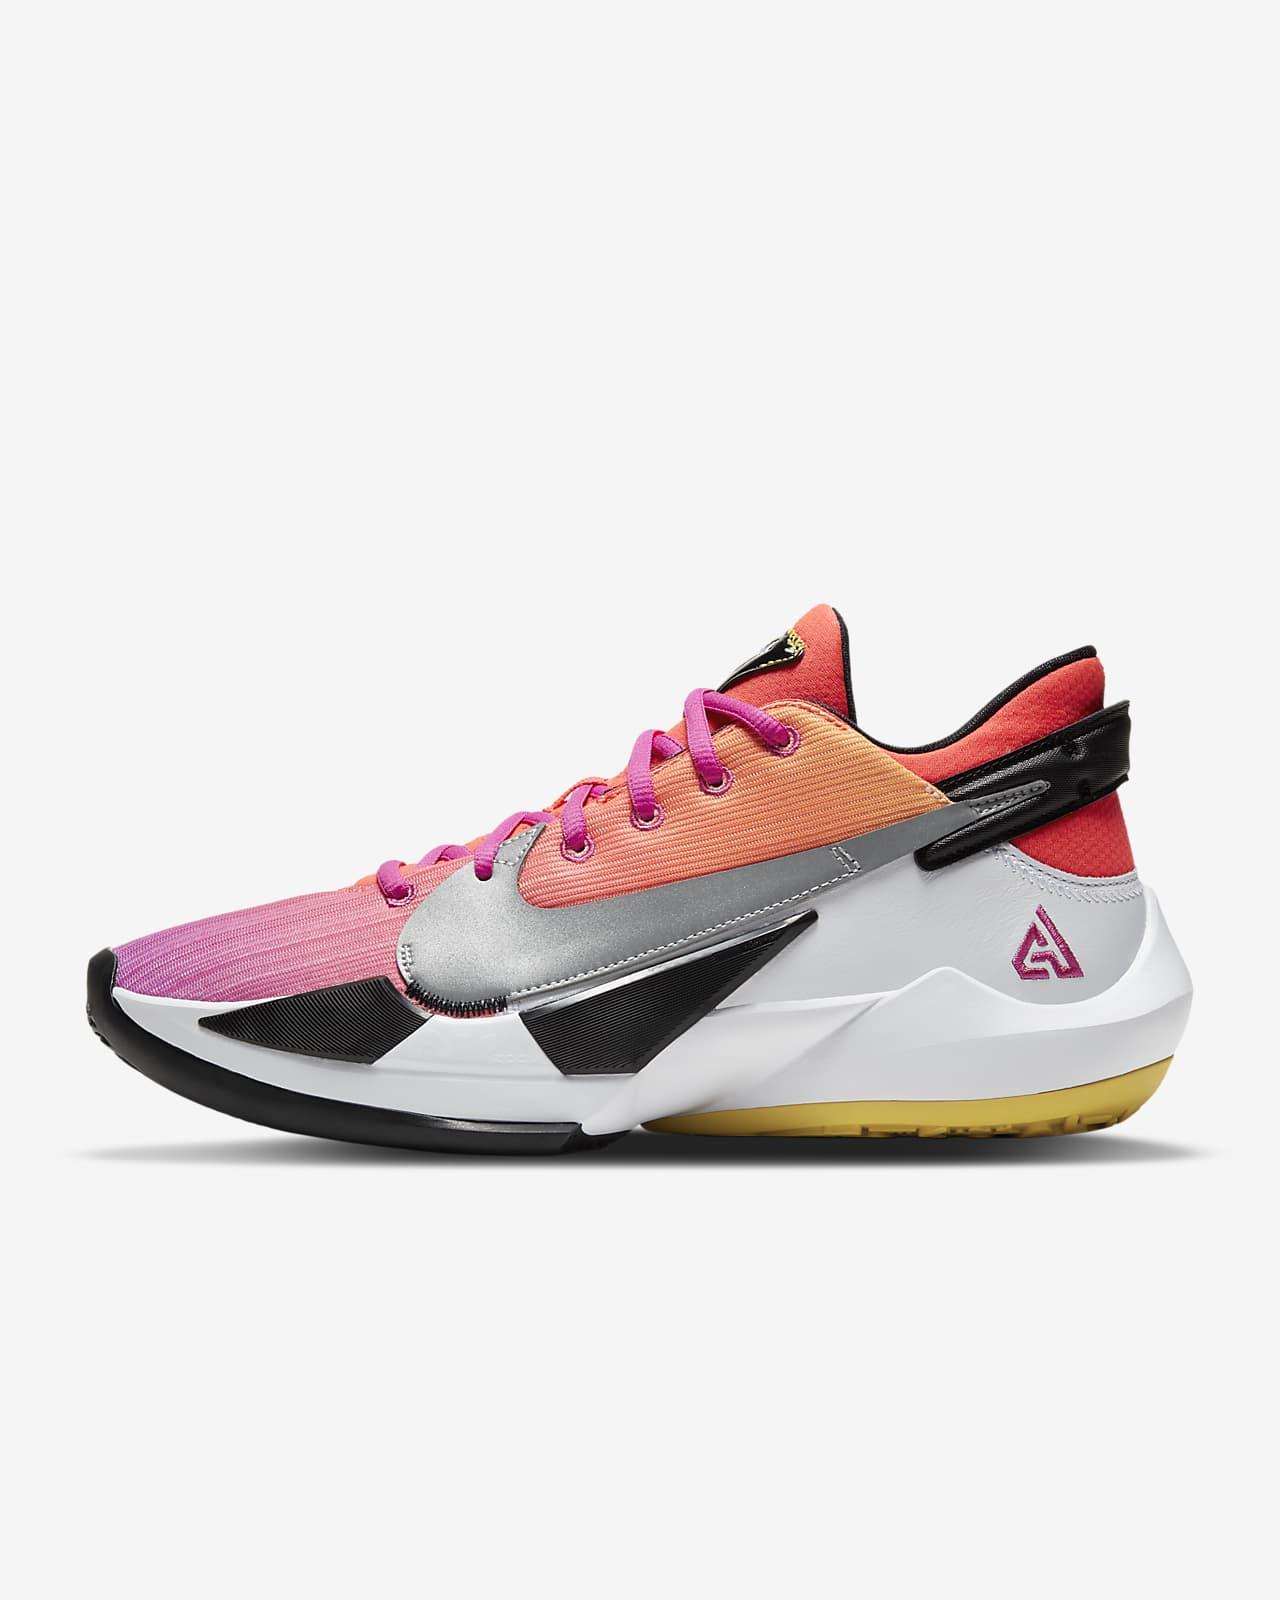 Chaussure de basketball Zoom Freak 2